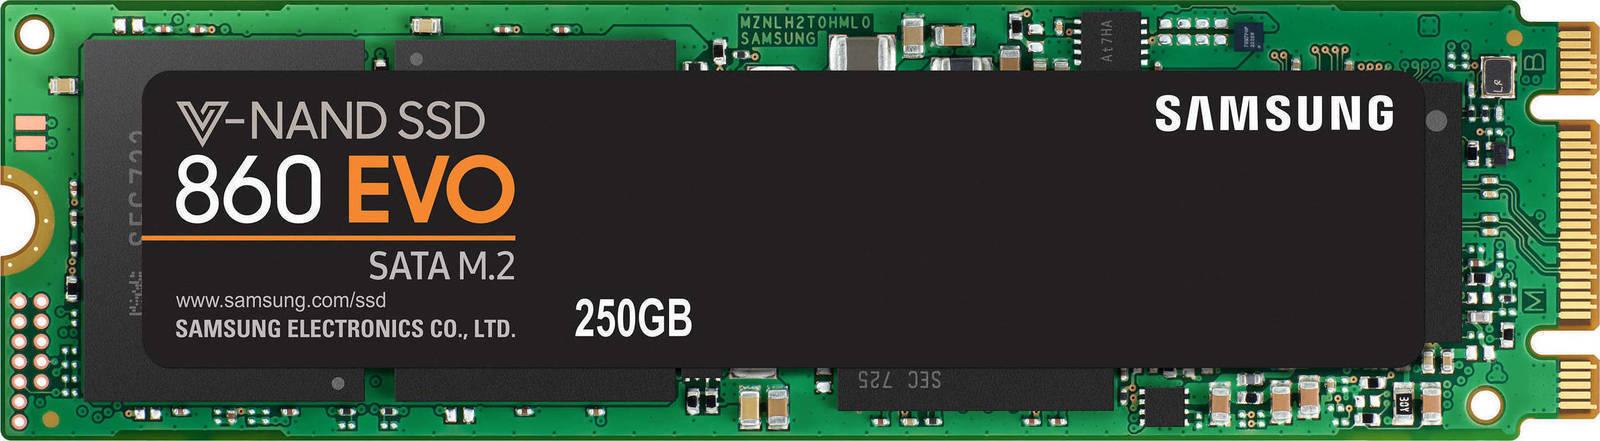 Samsung 860 Evo M.2 250GB Σκληρός Δίσκος SSD